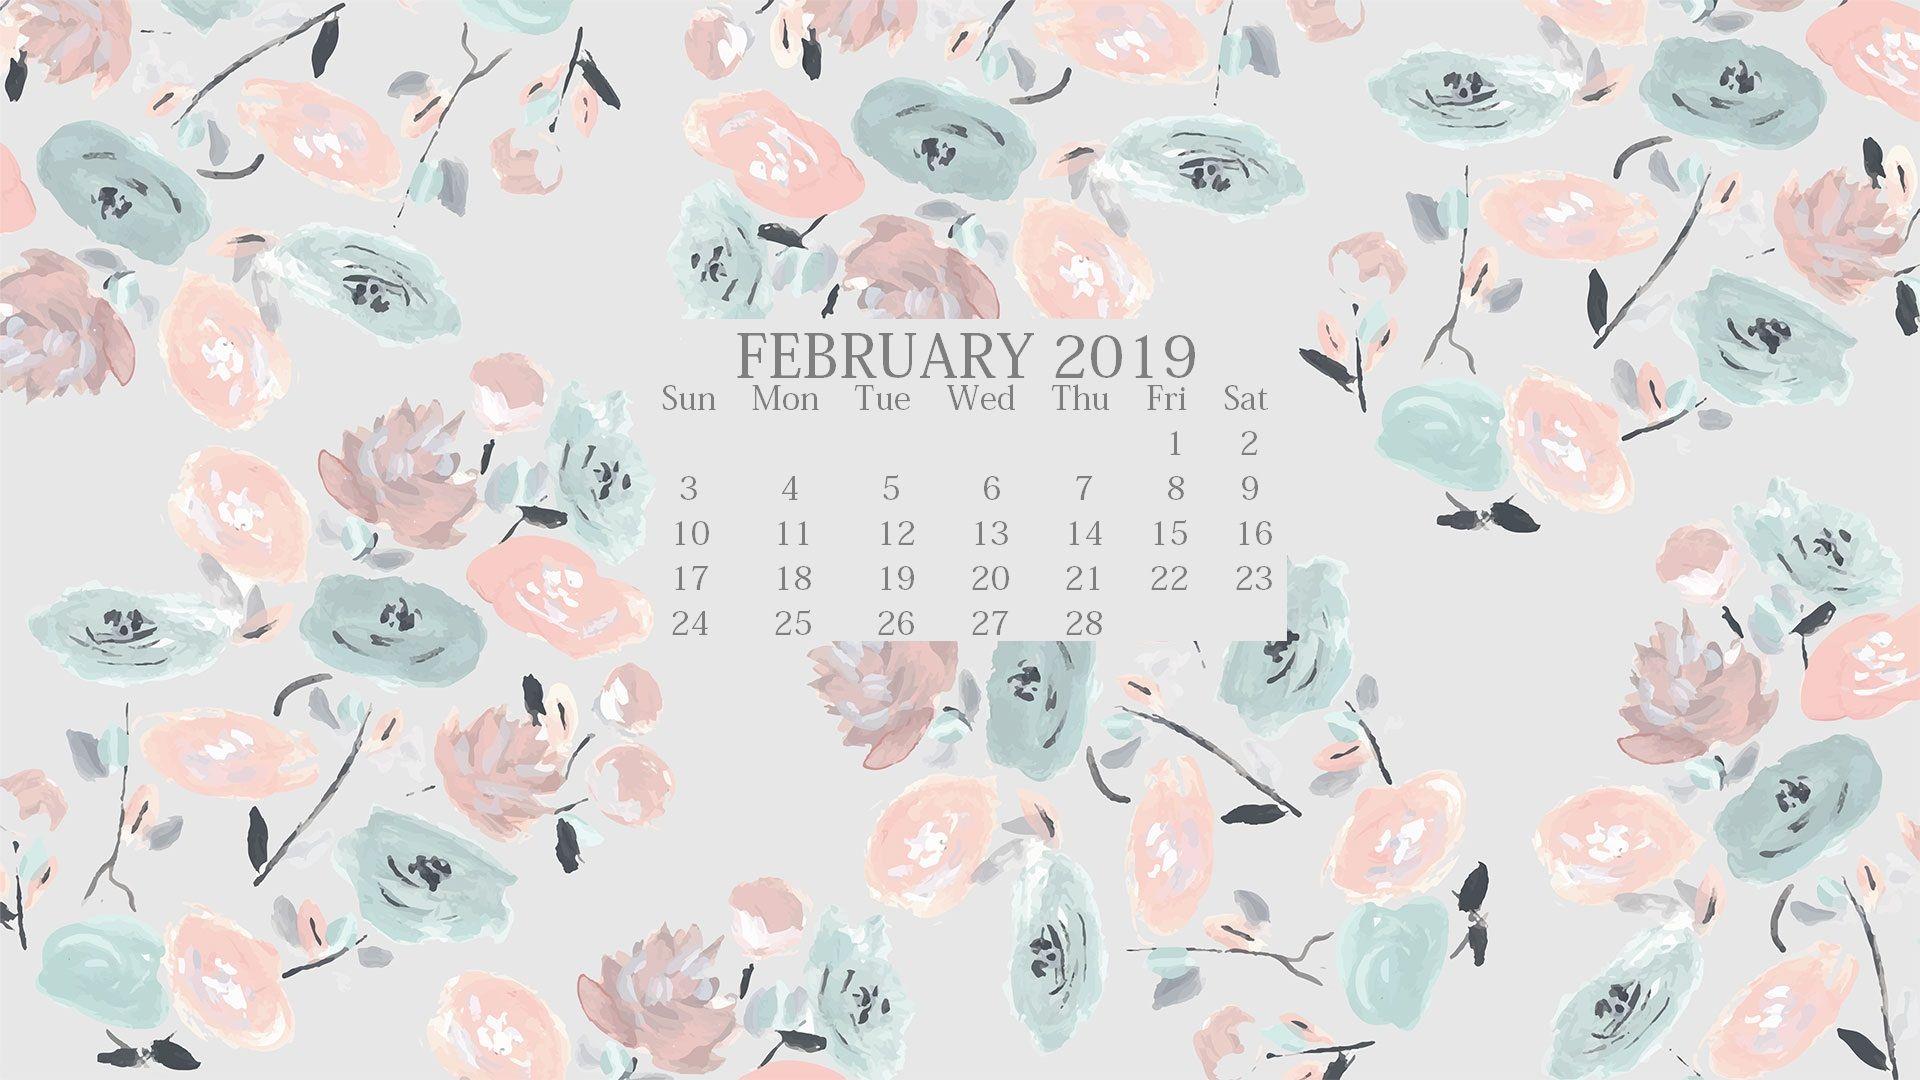 Cute 2019 Background Screensaver February Wallpaper Calendar